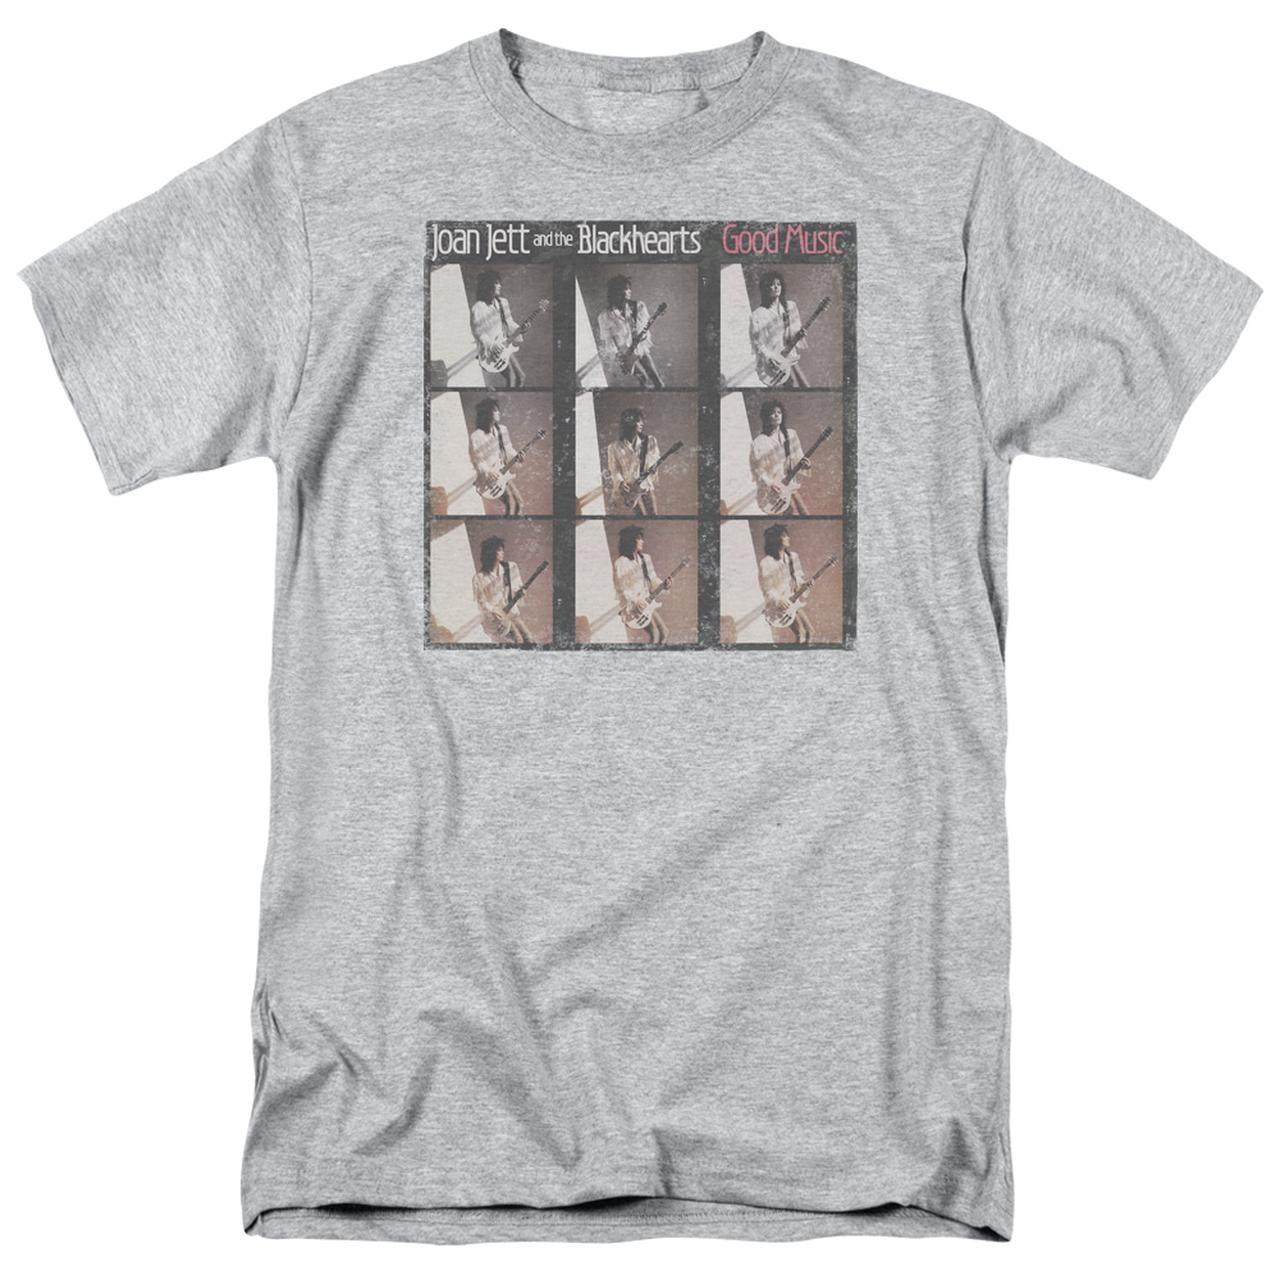 Joan Jett & The Blackhearts Shirt | GOOD MUSIC T Shirt